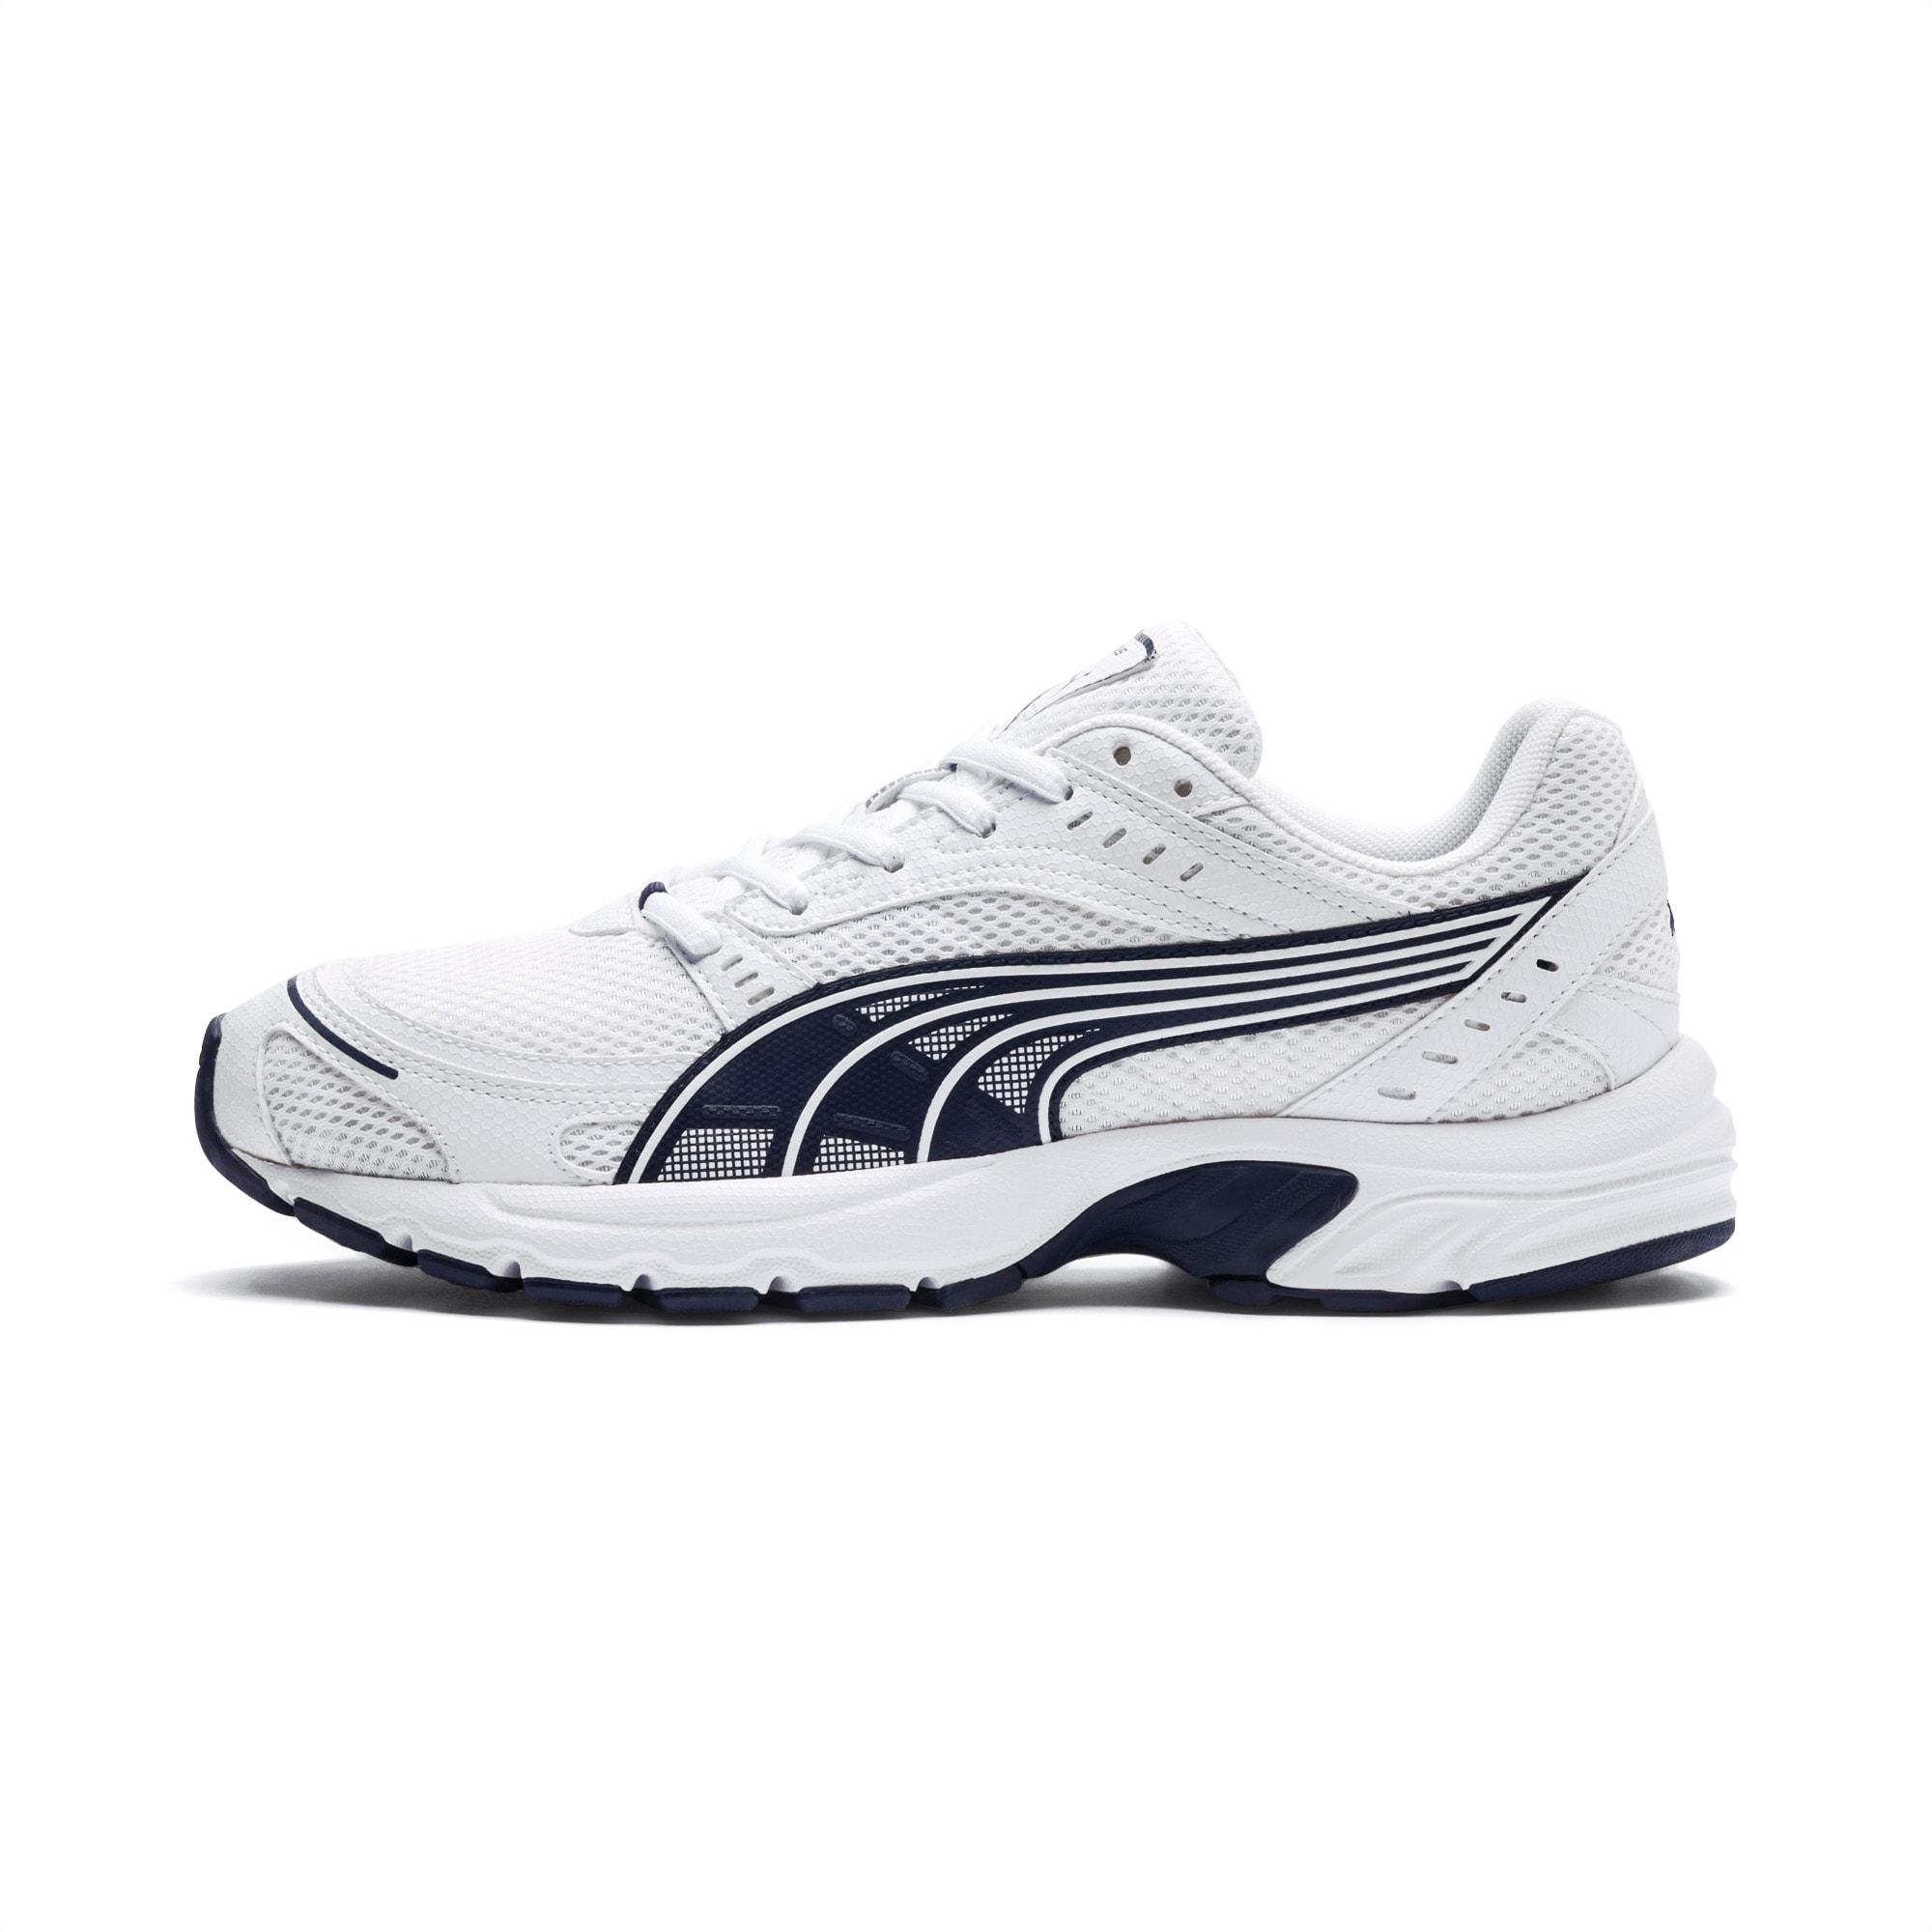 Inválido maestría diario  Axis IMEVA SoftFoam+ Sneakers | Puma White-Peacoat | PUMA Online Exclusive  | PUMA